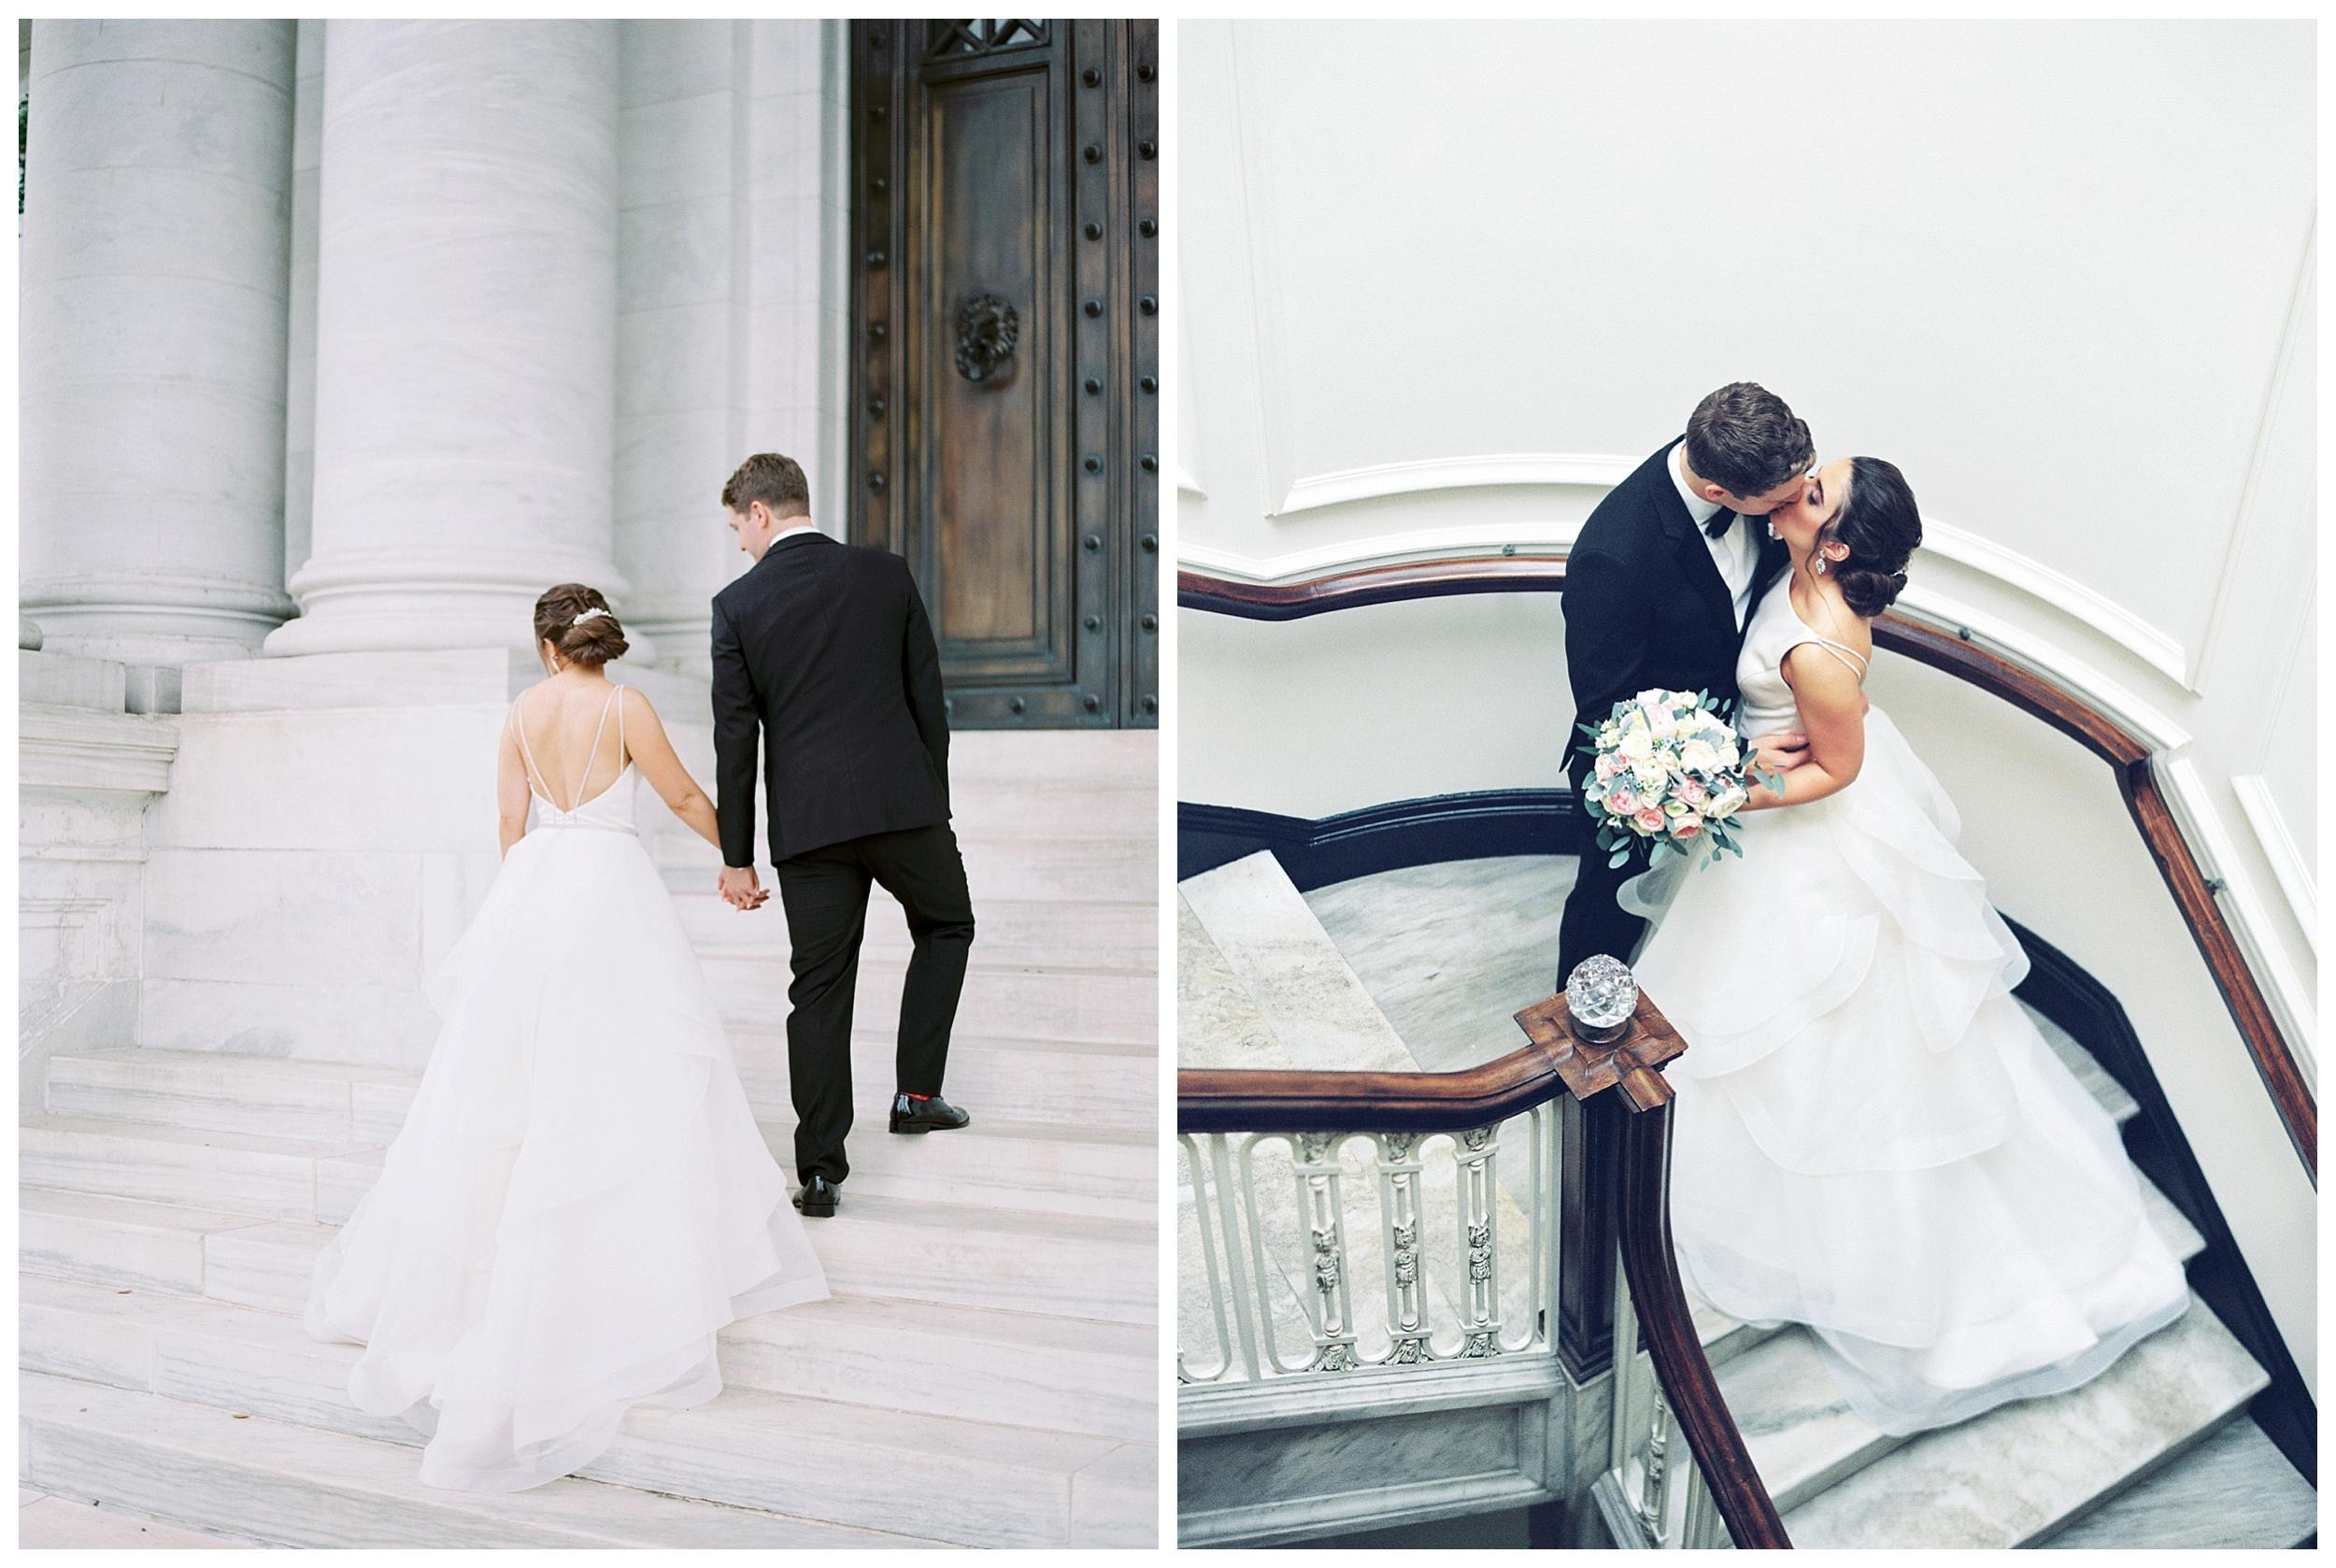 DAR Constitution Hall Wedding Wedding | Daughters of the American Revolution Wedding | District of Columbia Film Wedding Photographer Kir Tuben_0120.jpg